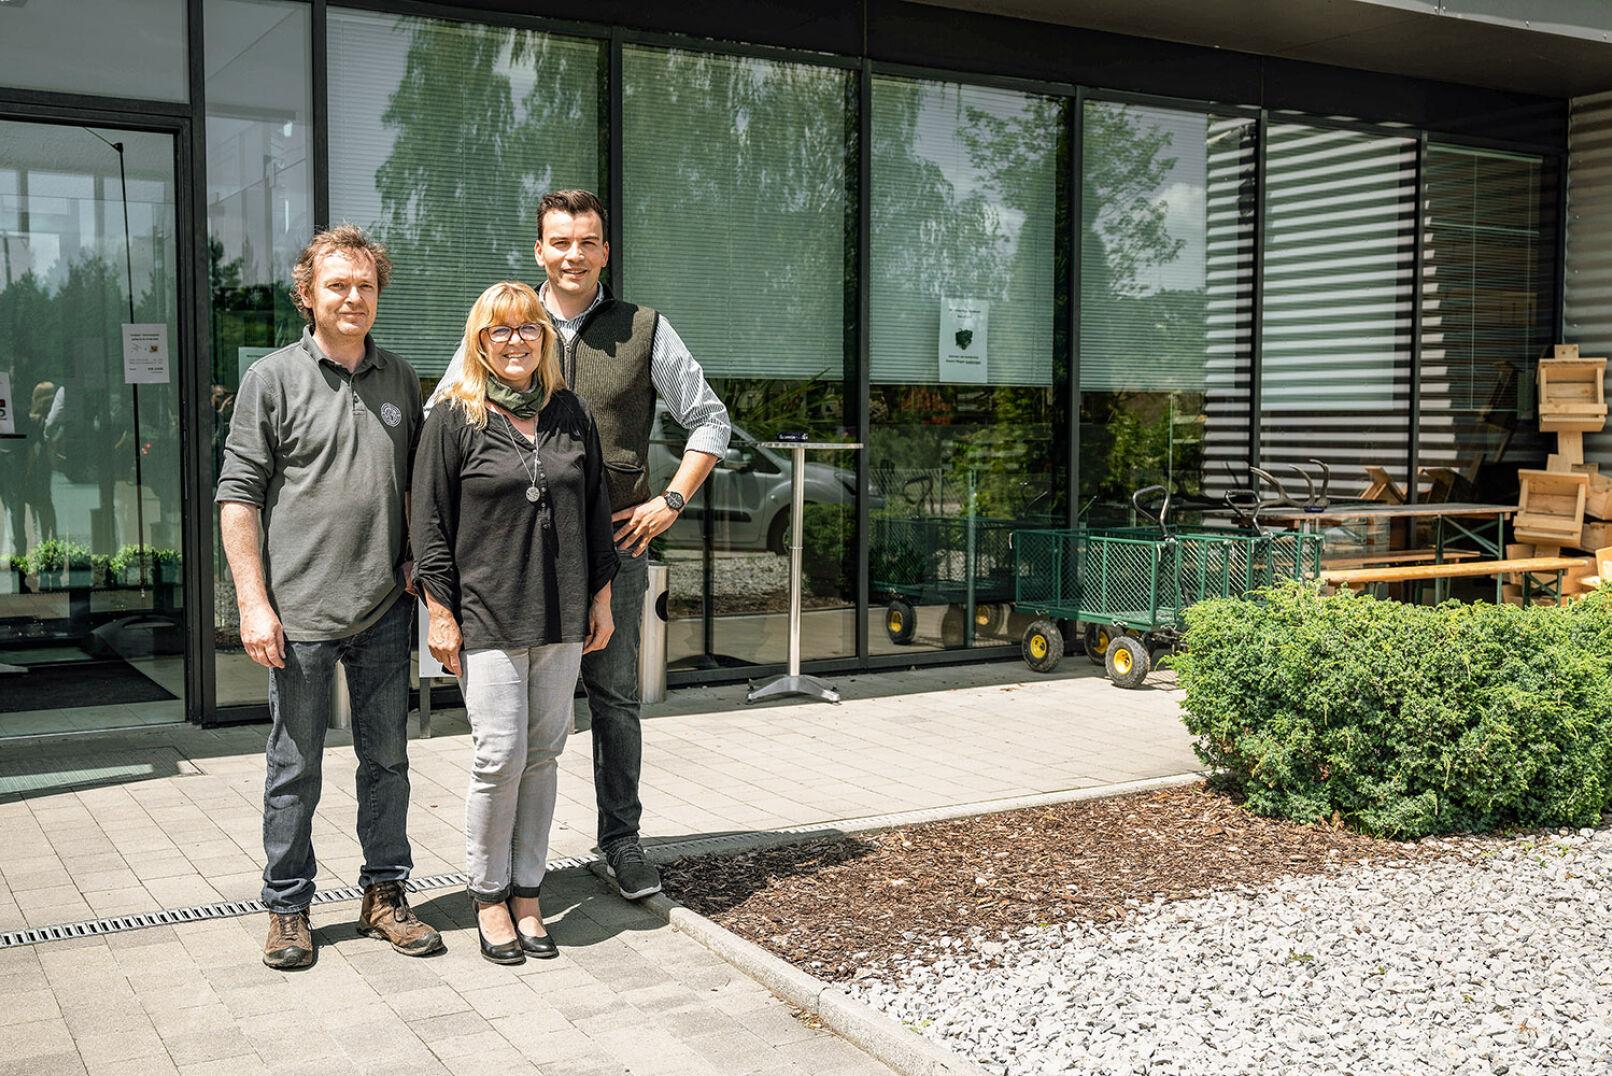 Büchsenmacher Gerald Artner, Doris Fürster (Büro, Shop), Leiter Carolus Haschka (v. l. n. r.) - © Barbara Marko